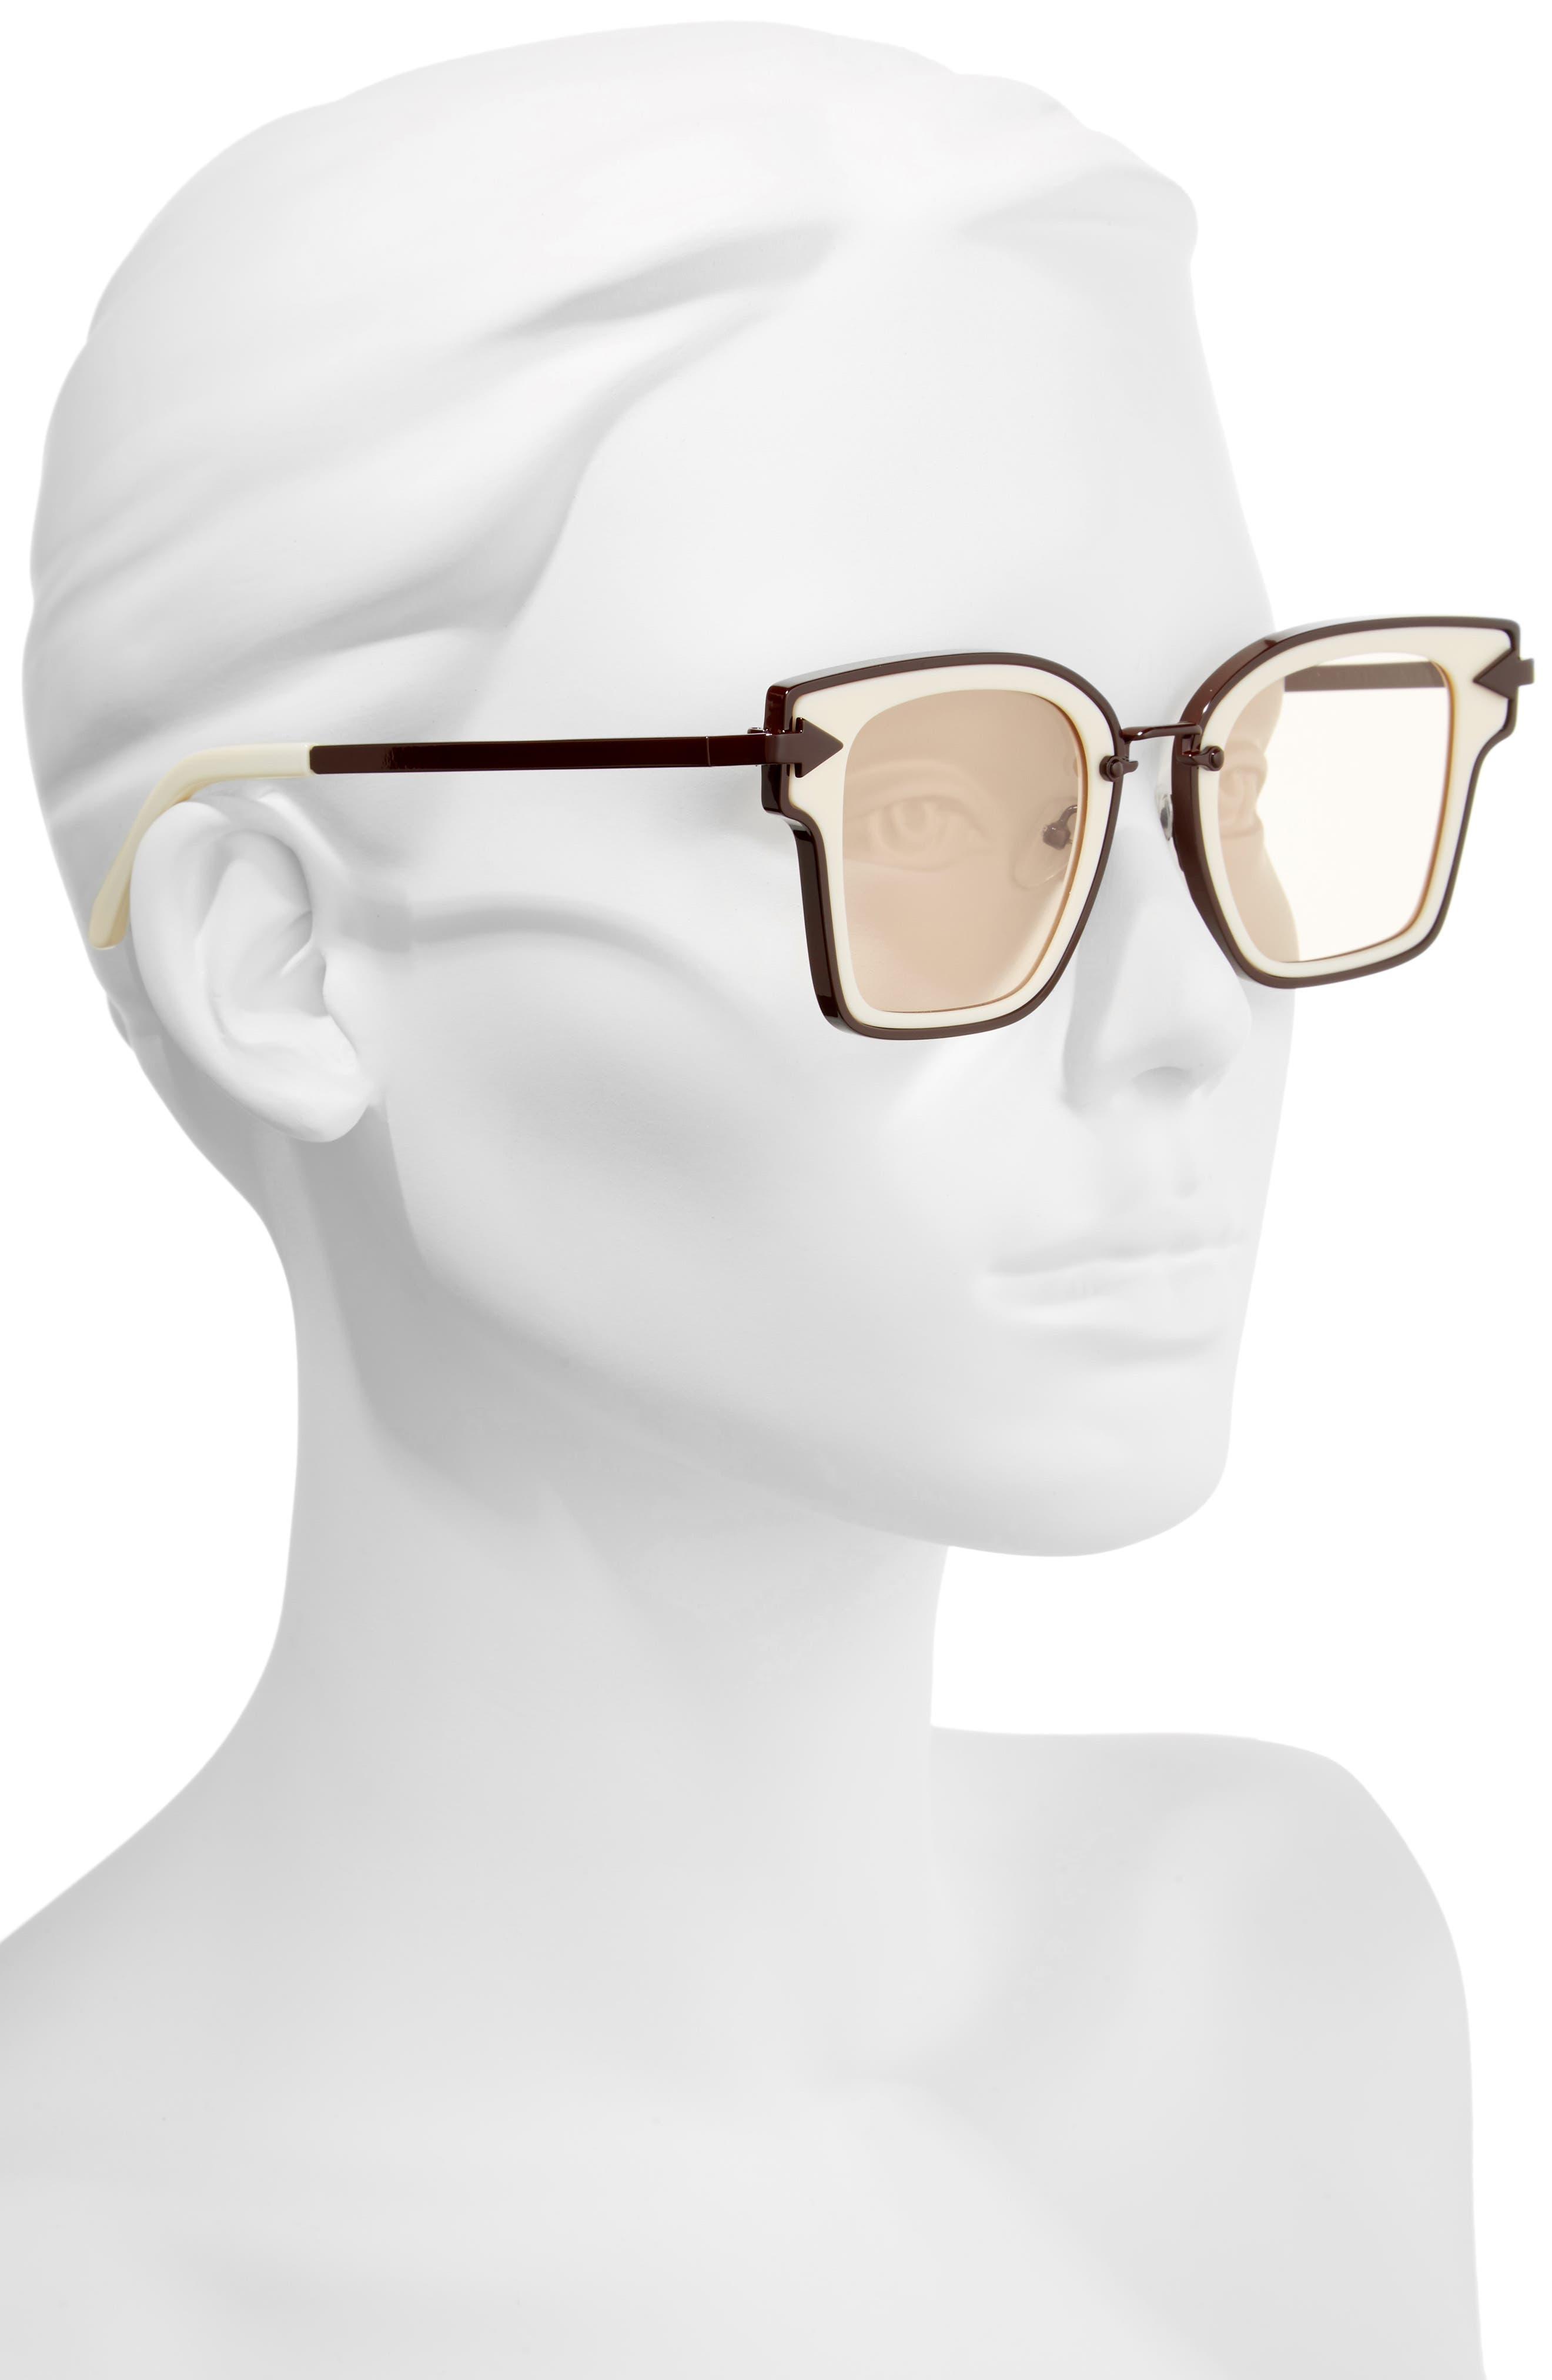 Rebellion 49mm Sunglasses,                             Alternate thumbnail 3, color,                             Ecru